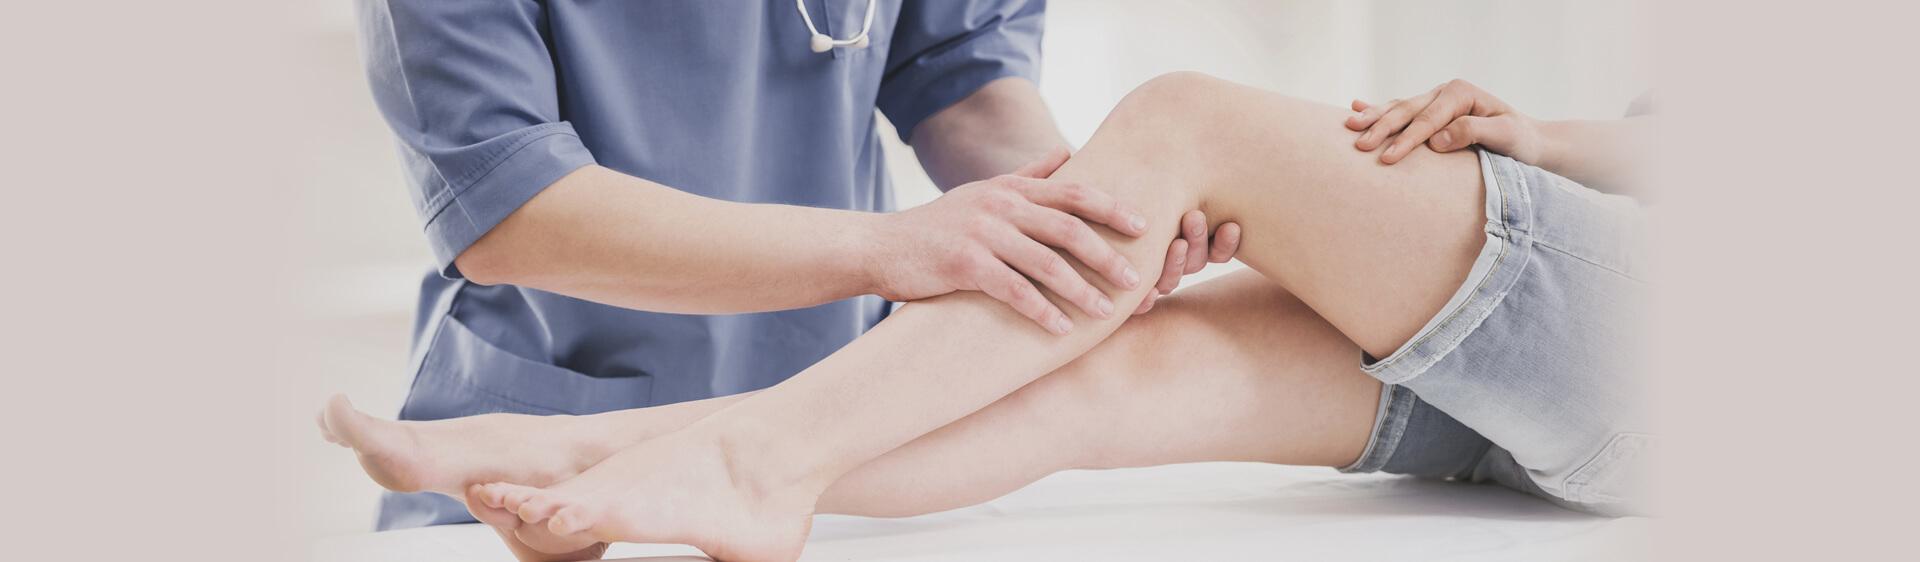 orthopaedic